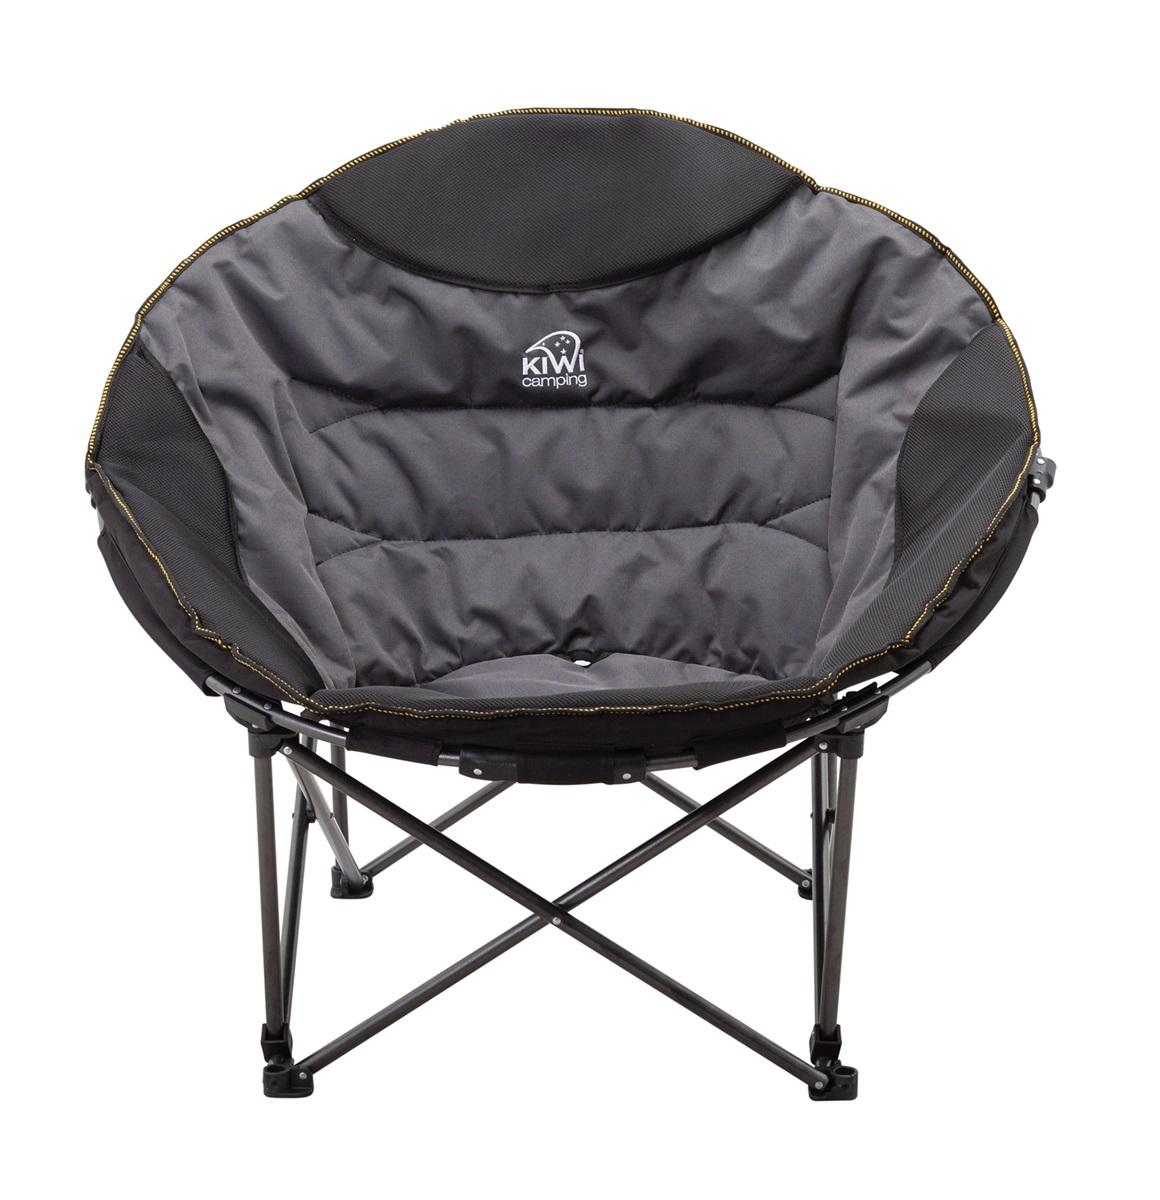 Kiwi Camping Stellar Moon Chair image